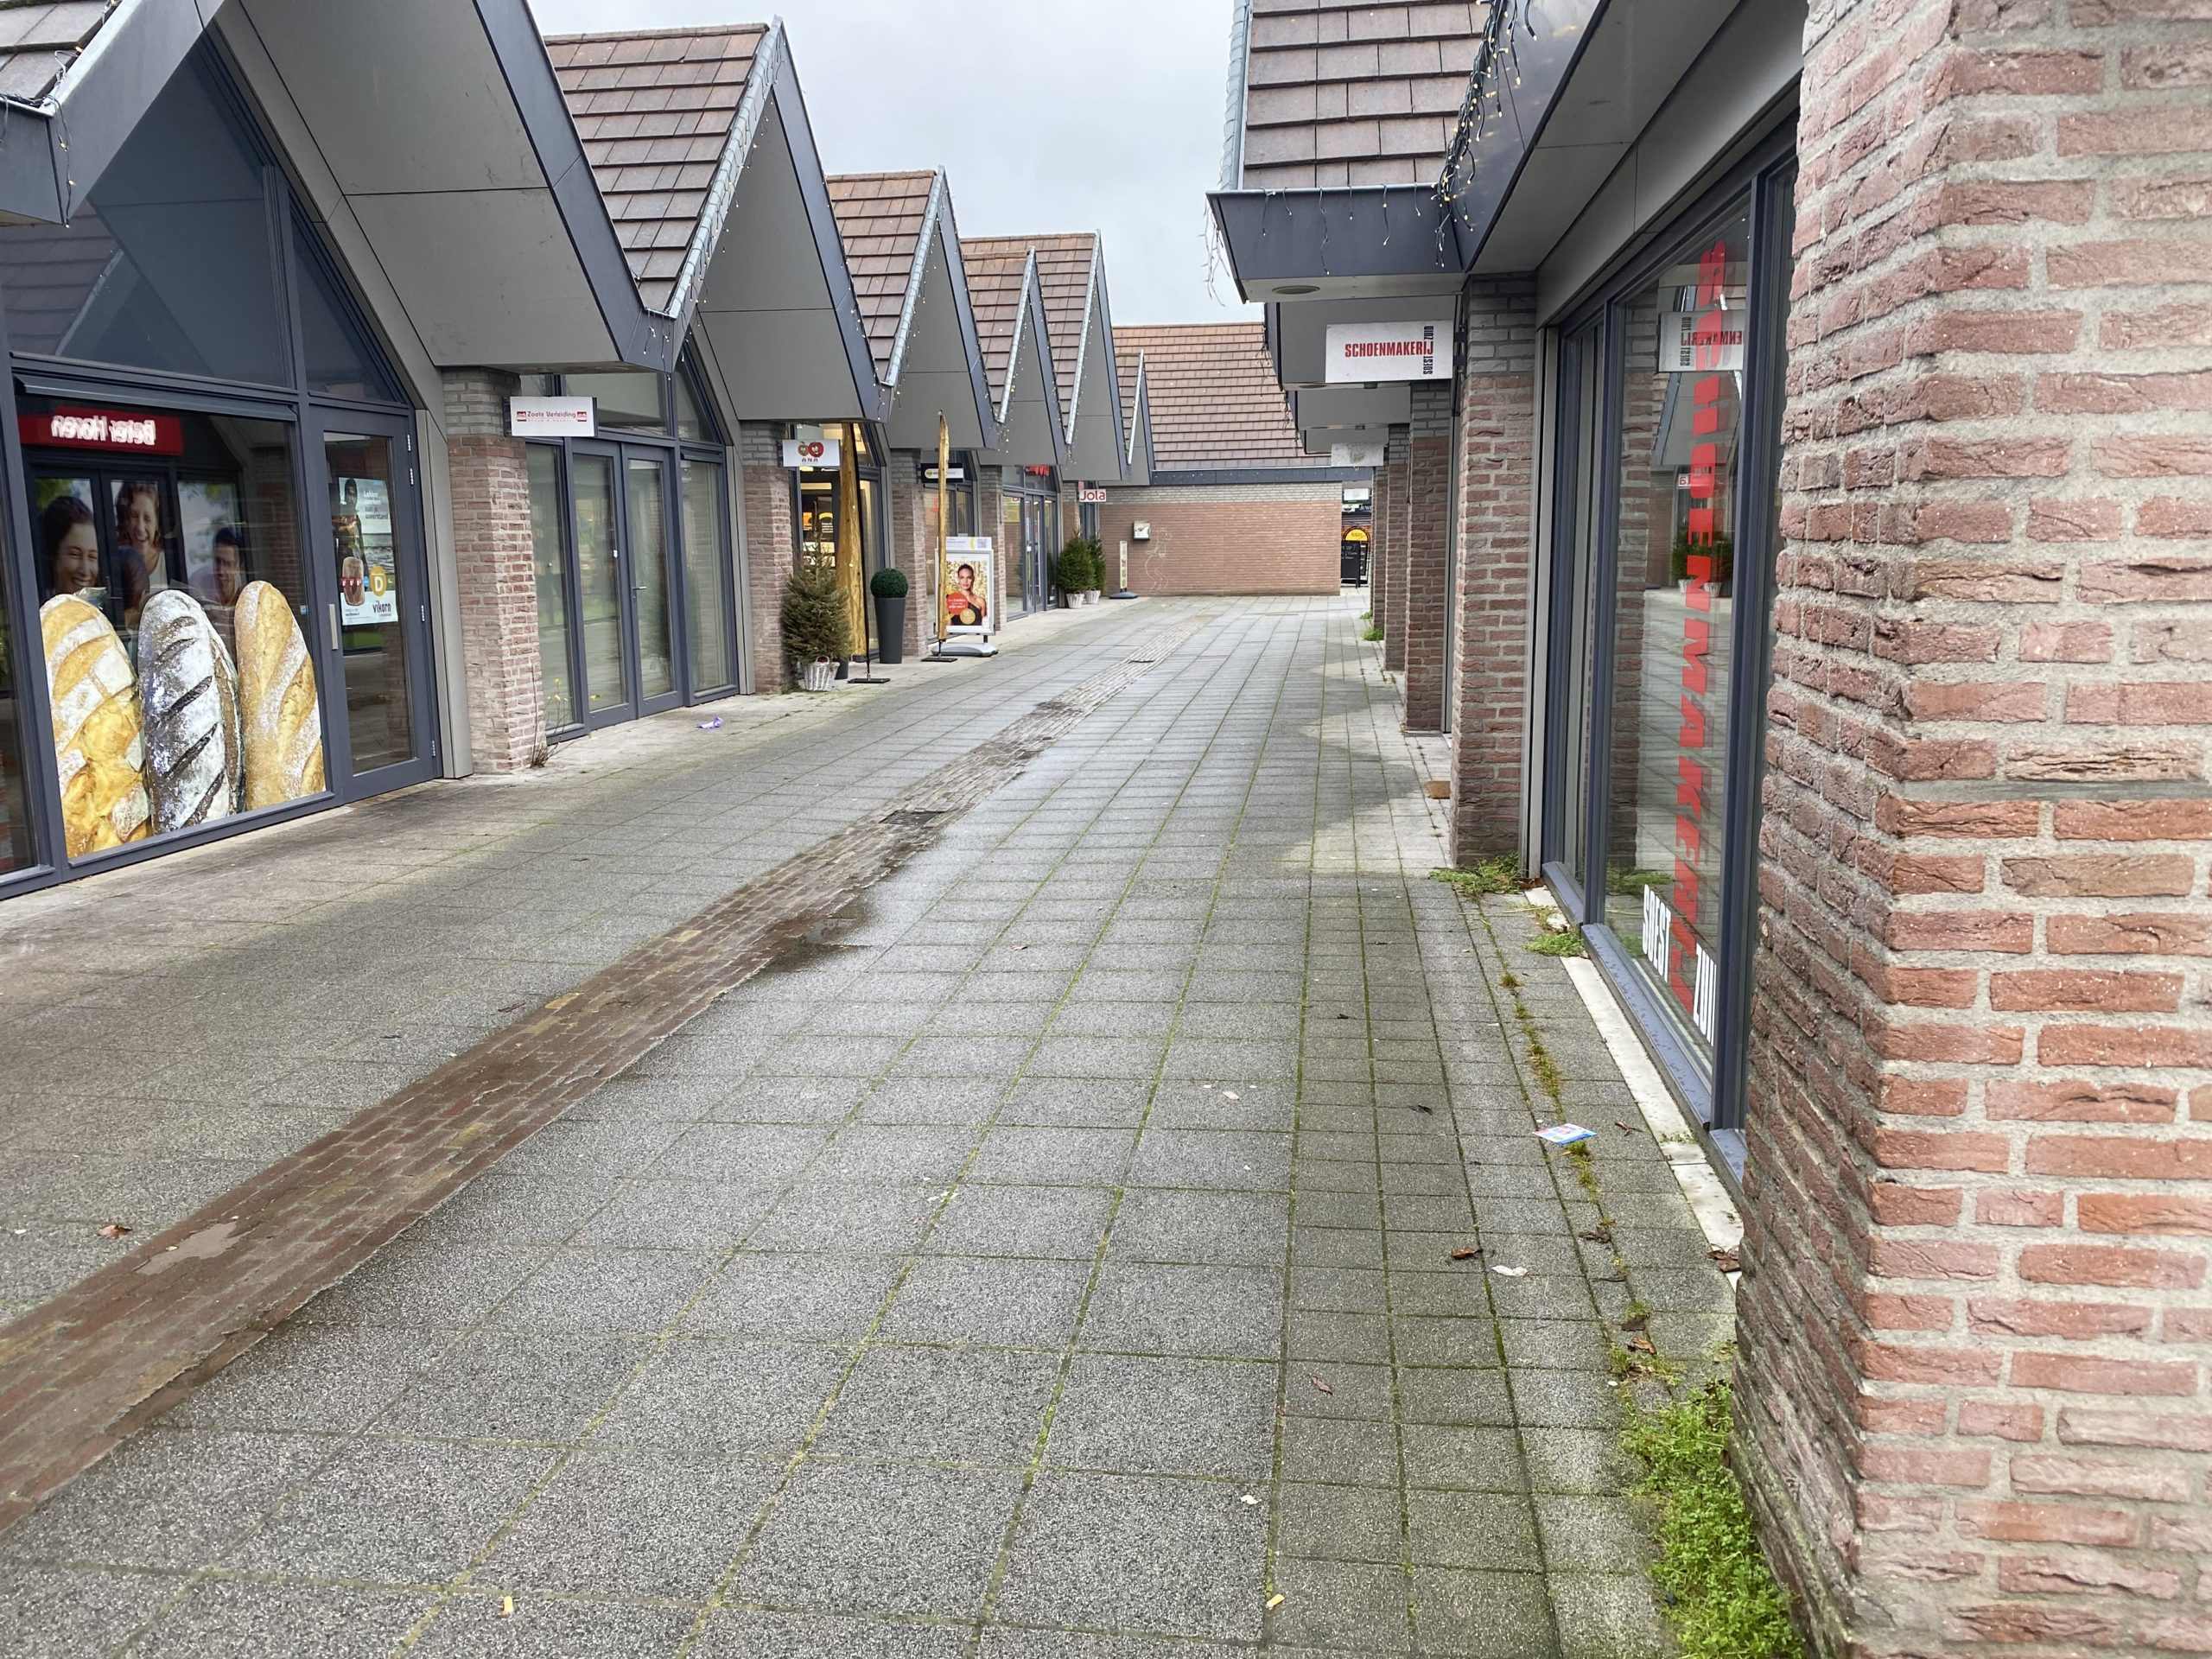 Winkelcentrum Soest Zuid 2